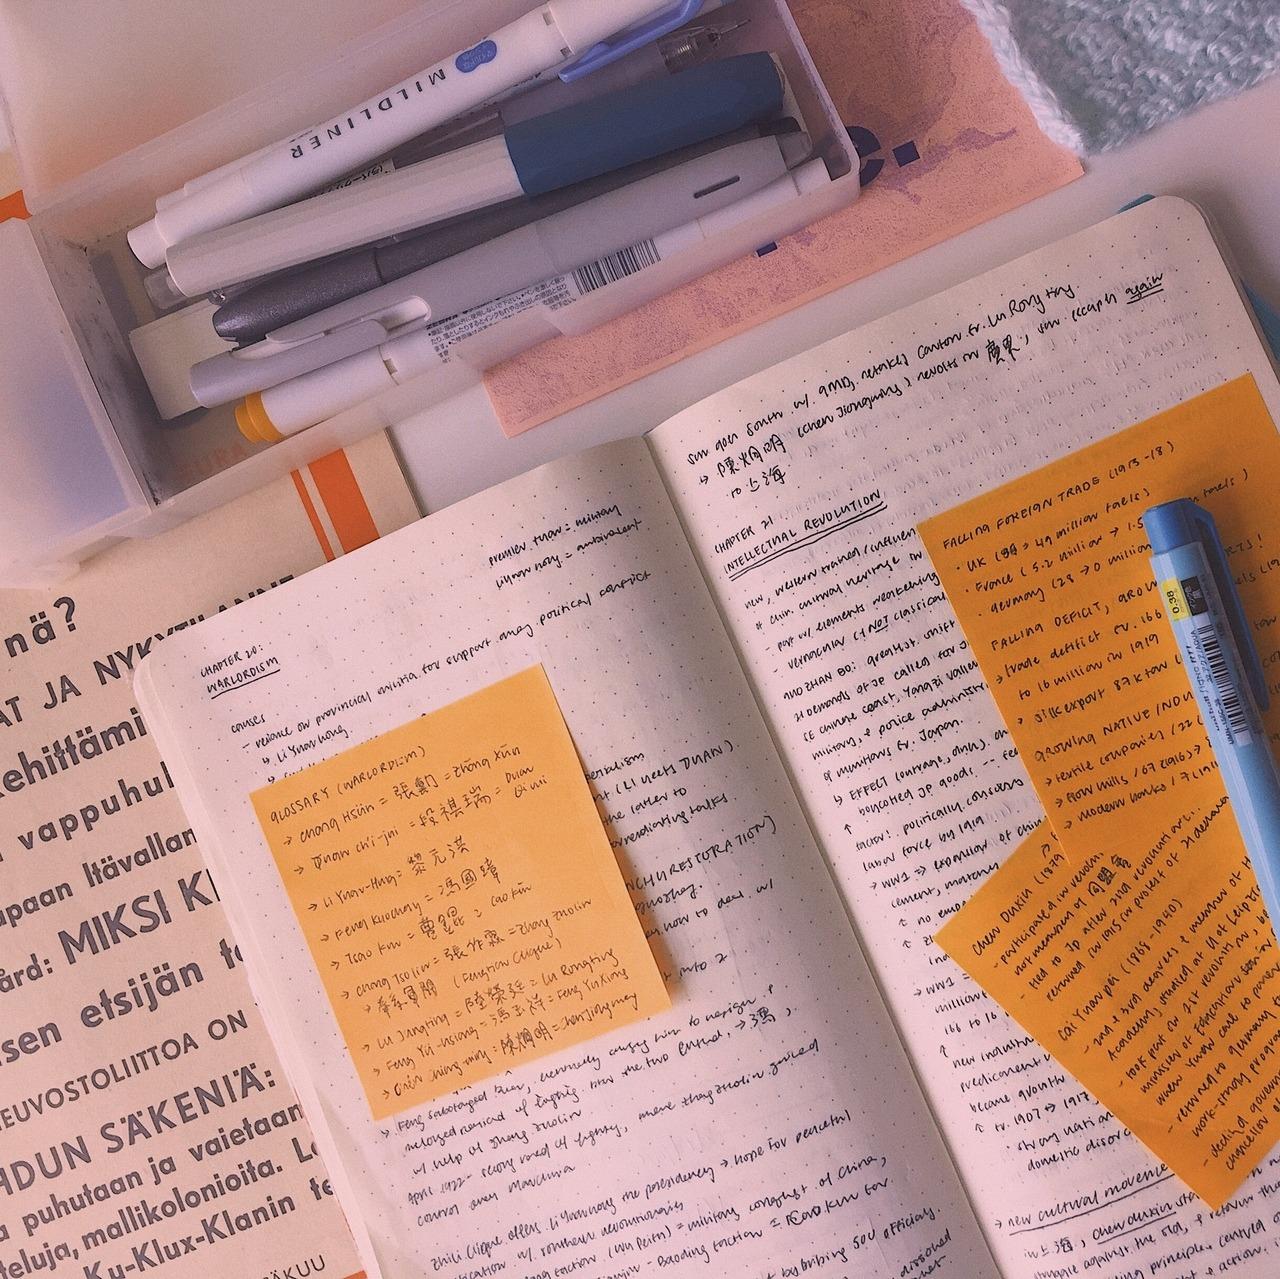 goals, notes, and office image, PENGALAMAN SEMESTER 3 DPIM DIPLOMA PENGURUSAN LADANG UiTM MELAKA KAMPUS JASIN